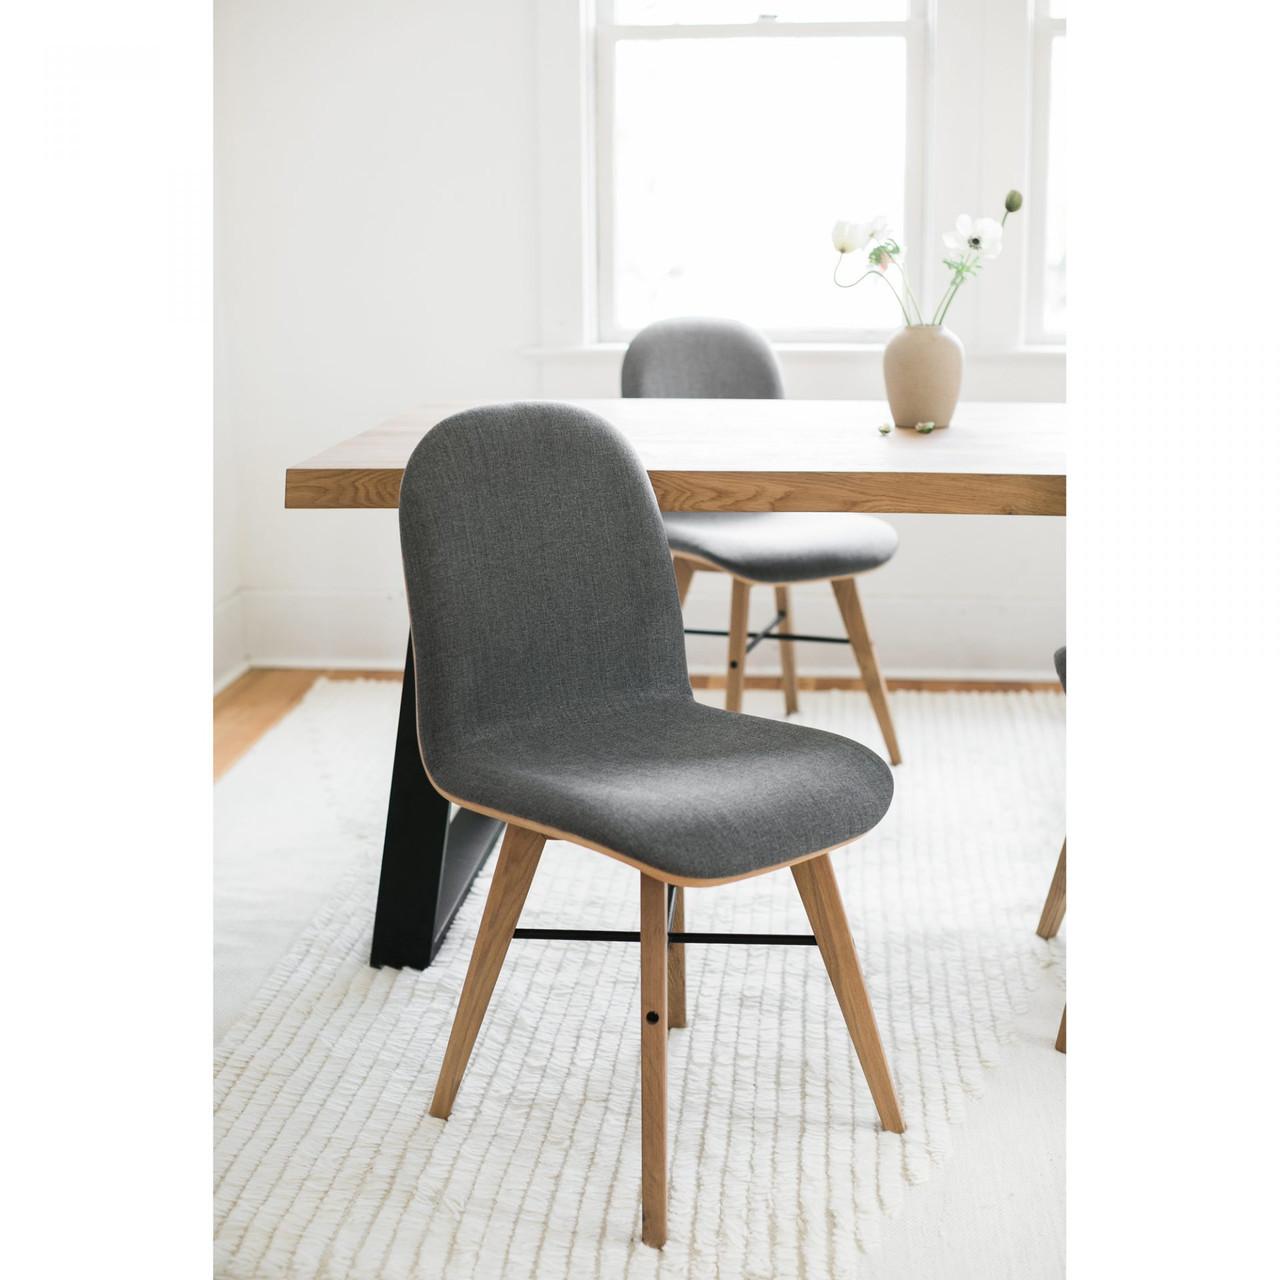 Naomie Dining Chair Grey - M2